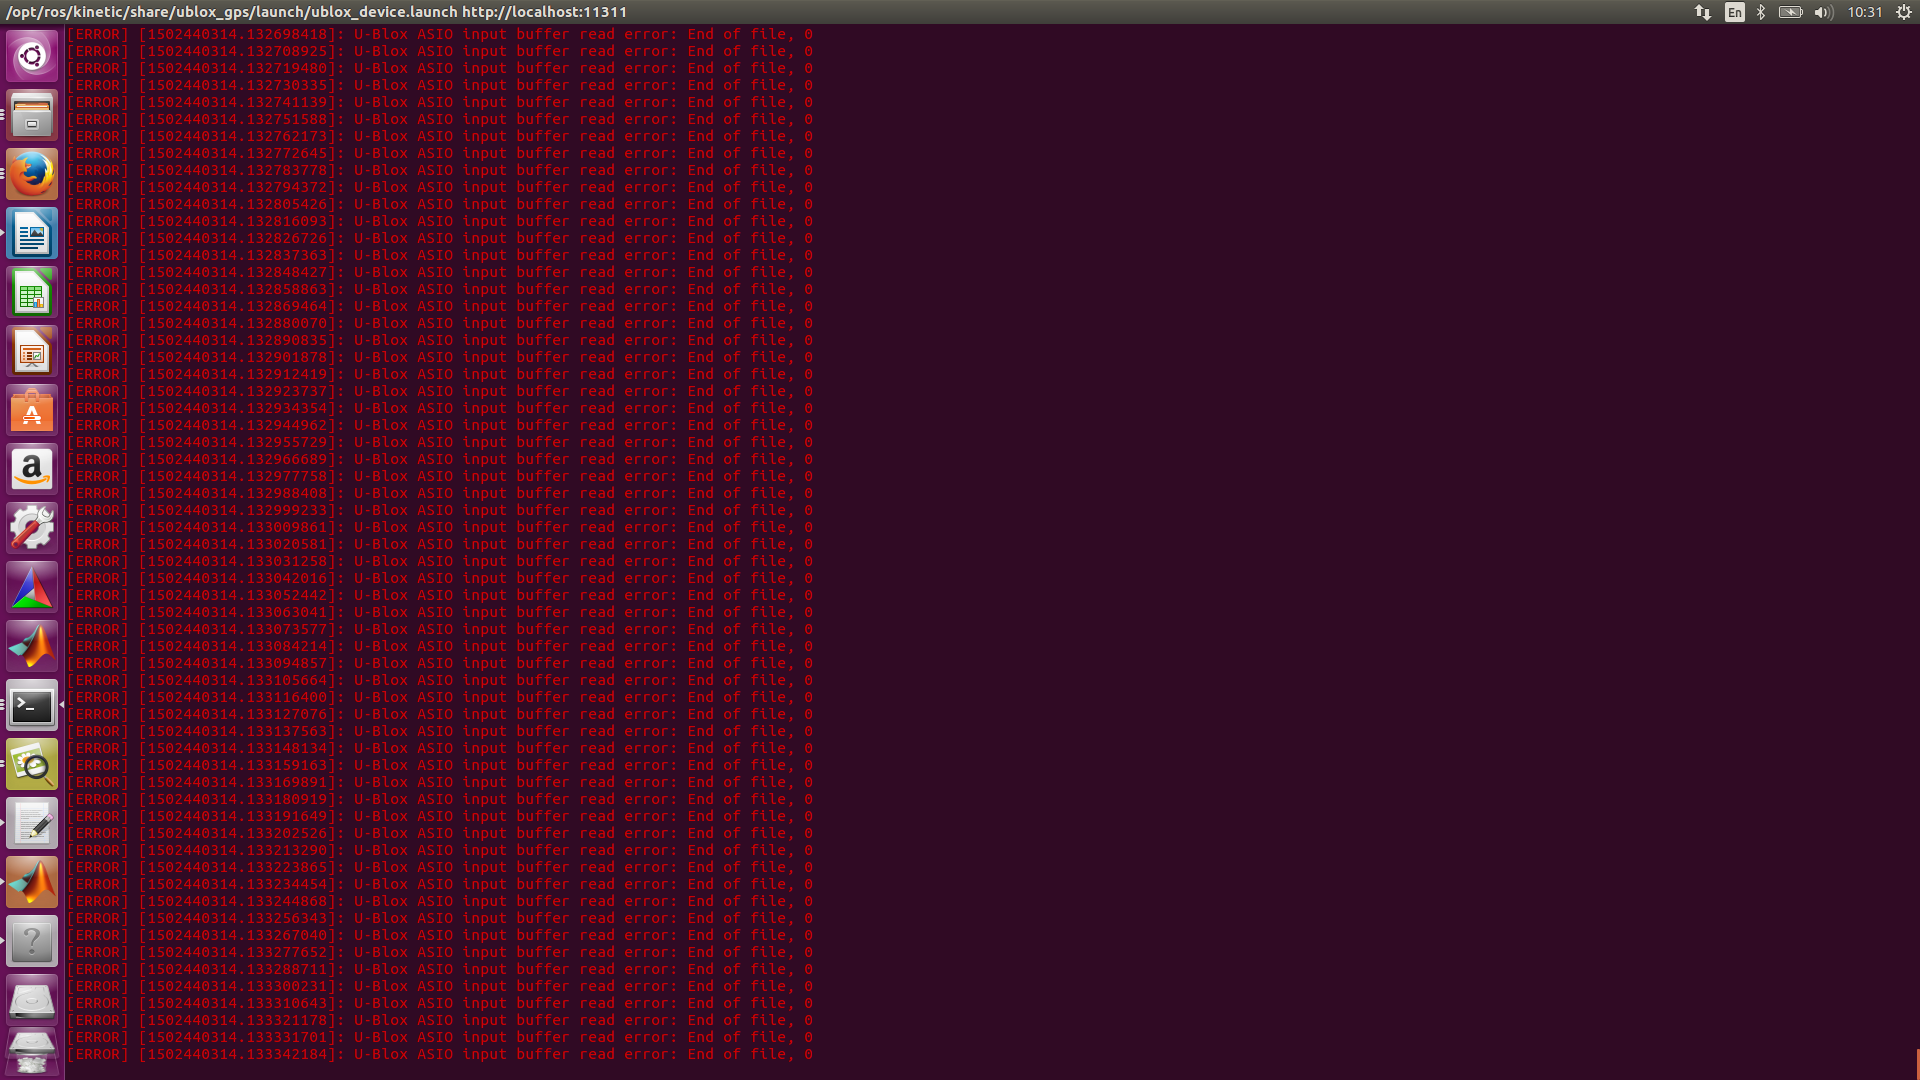 U-Blox ASIO input buffer read error: End of file, 0 · Issue